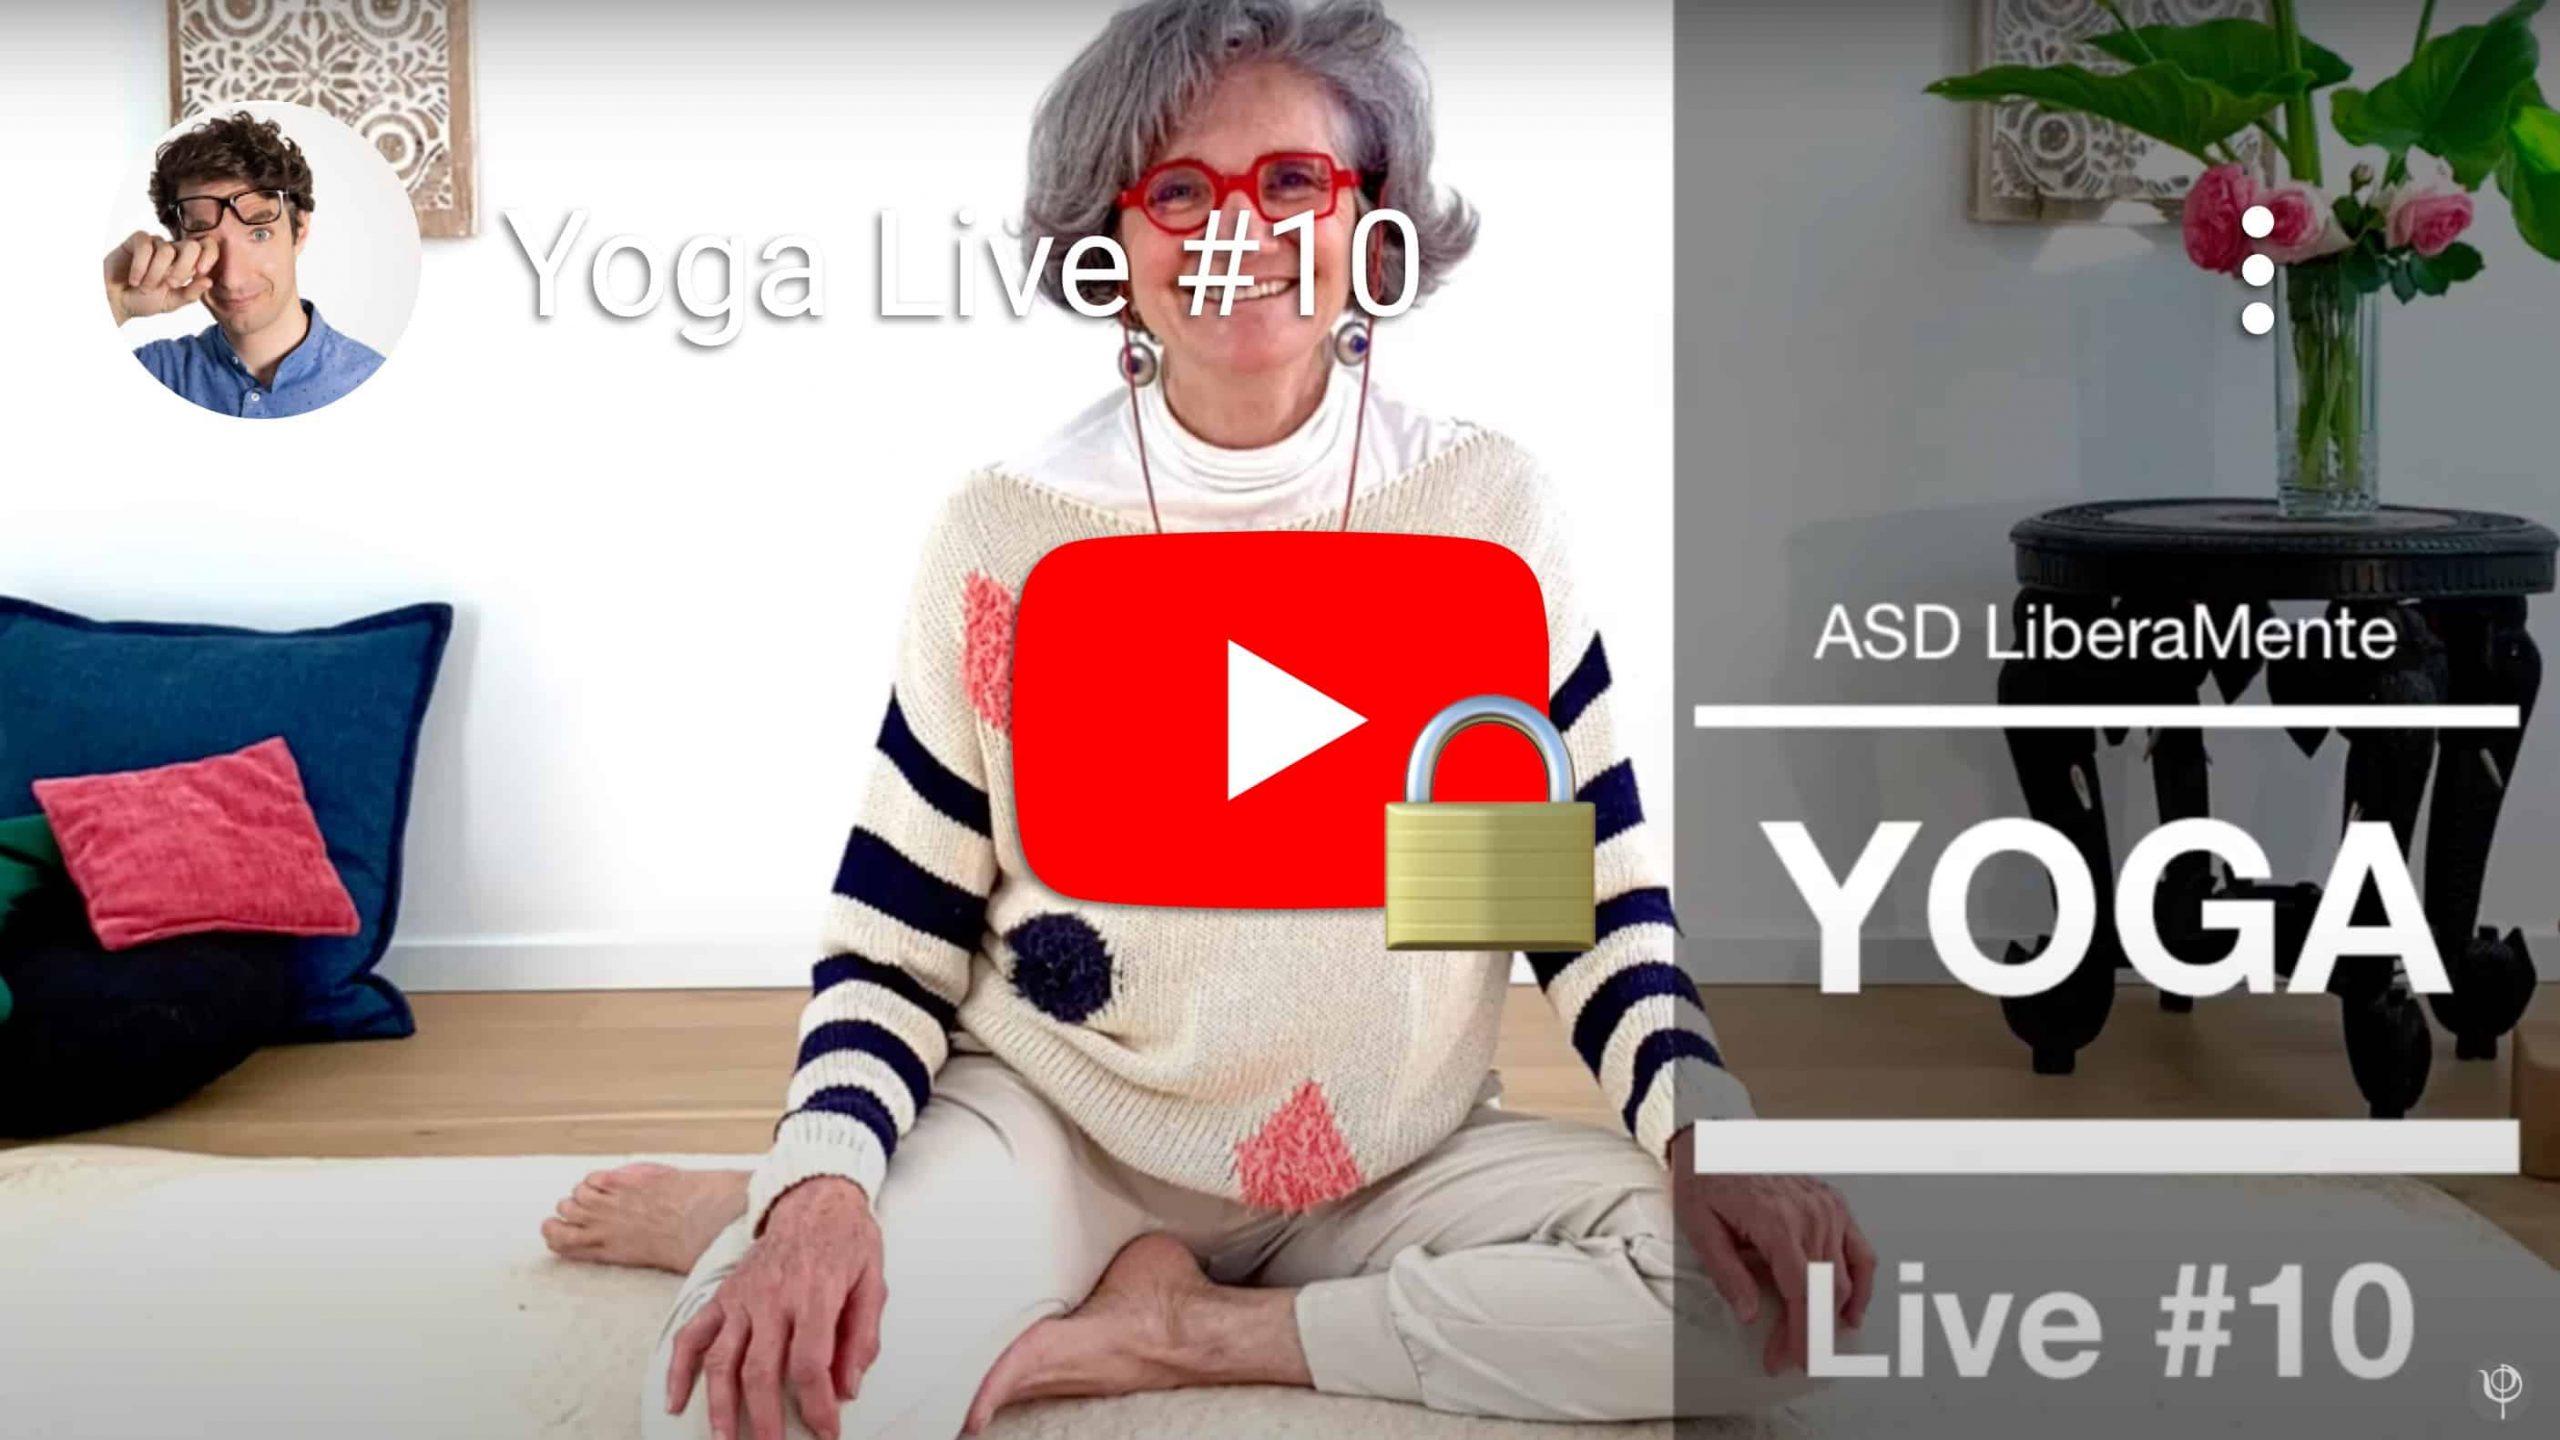 Yoga diretta Facebook #10